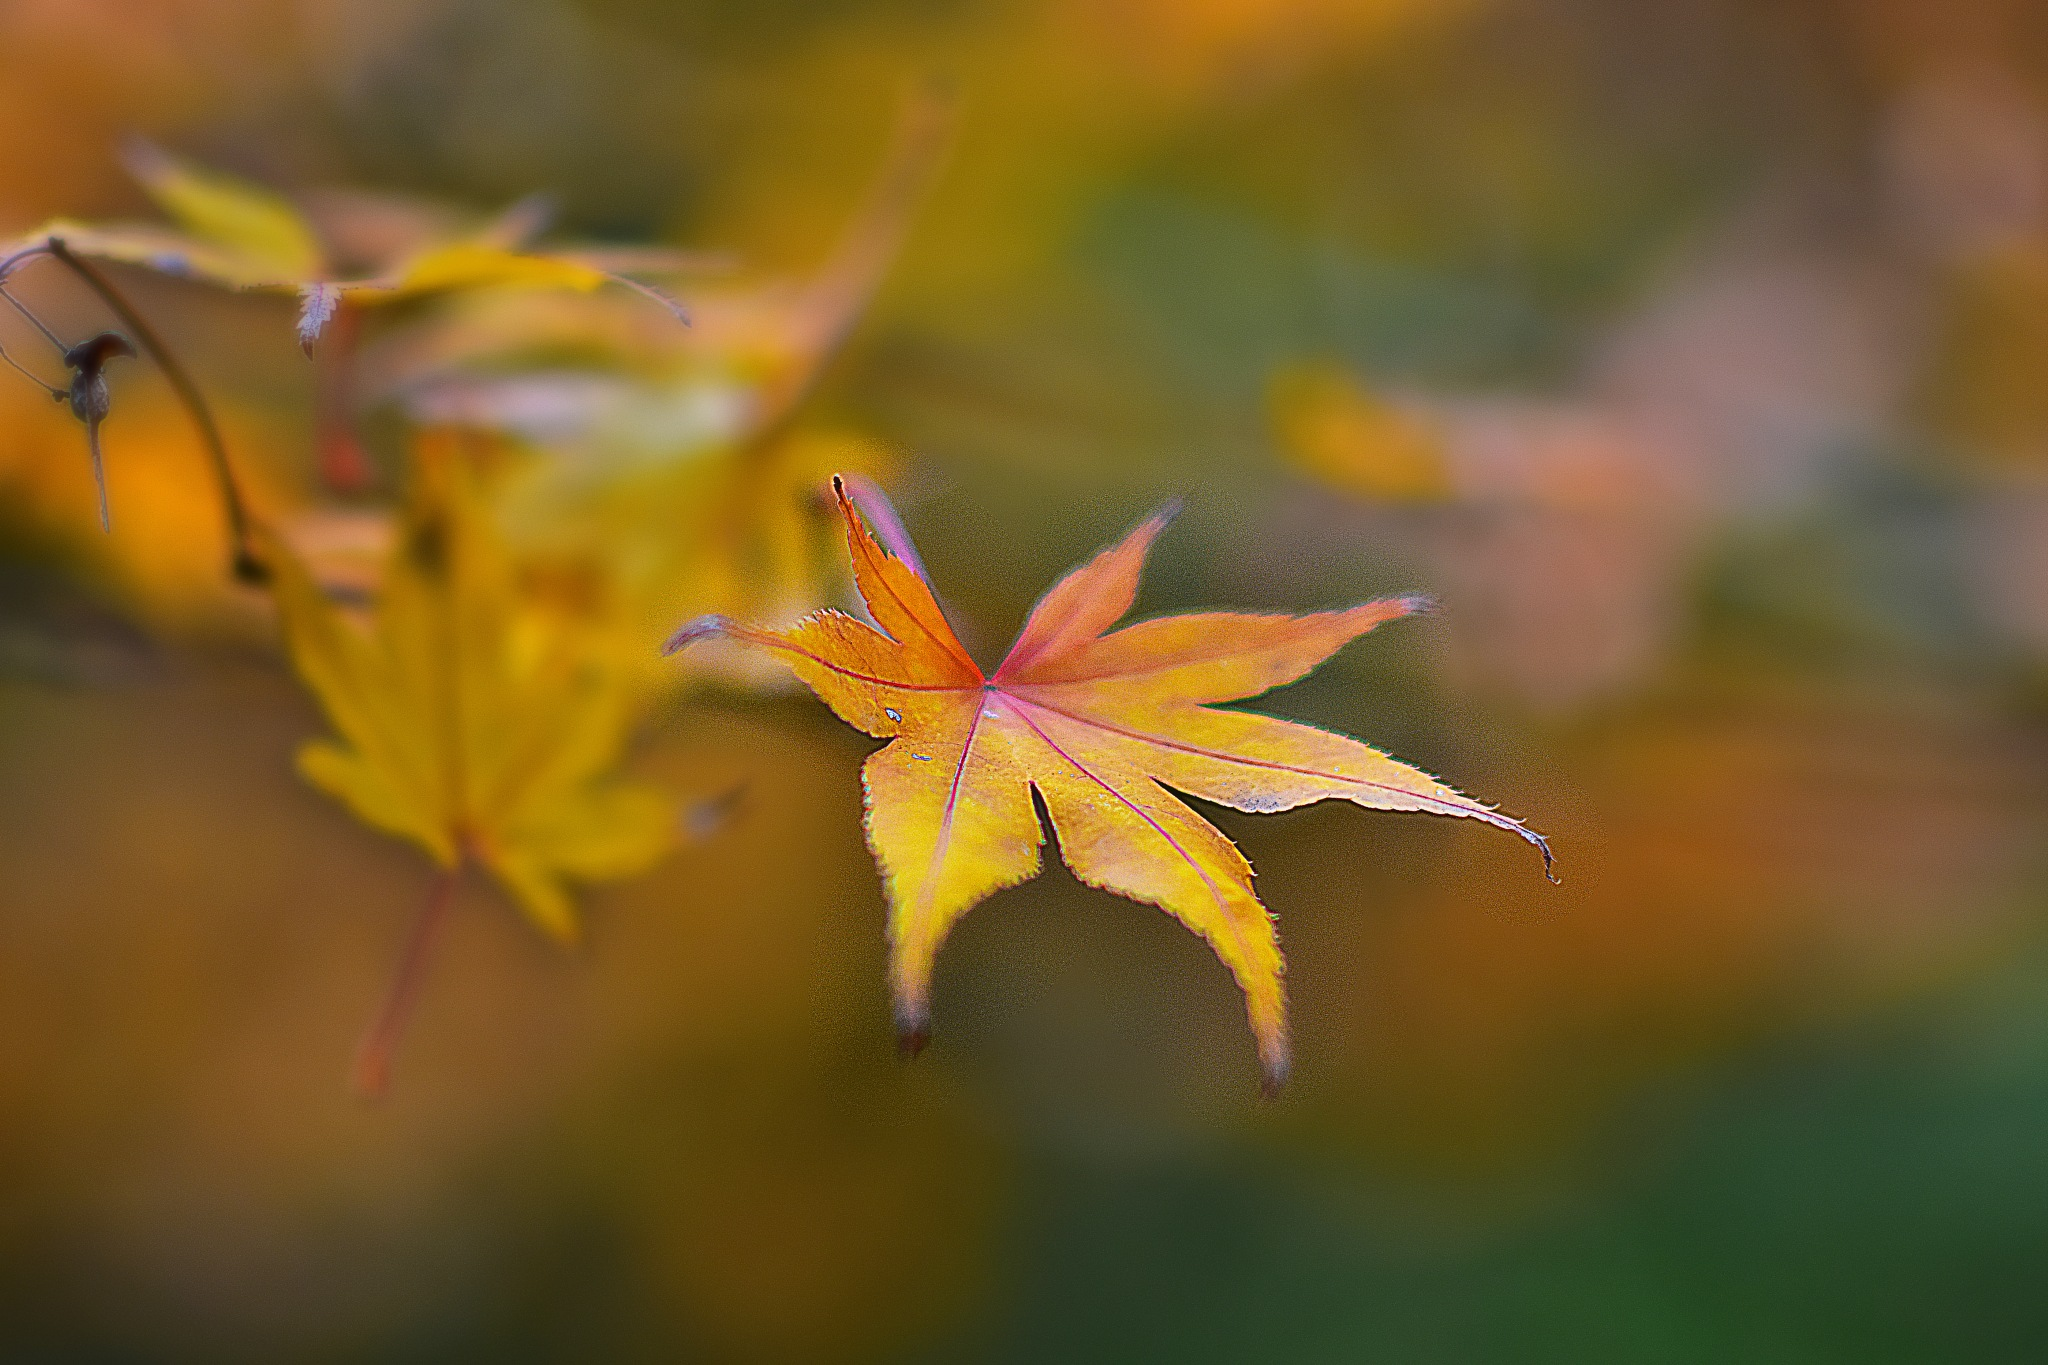 Leaf on A Tree by gregbahder